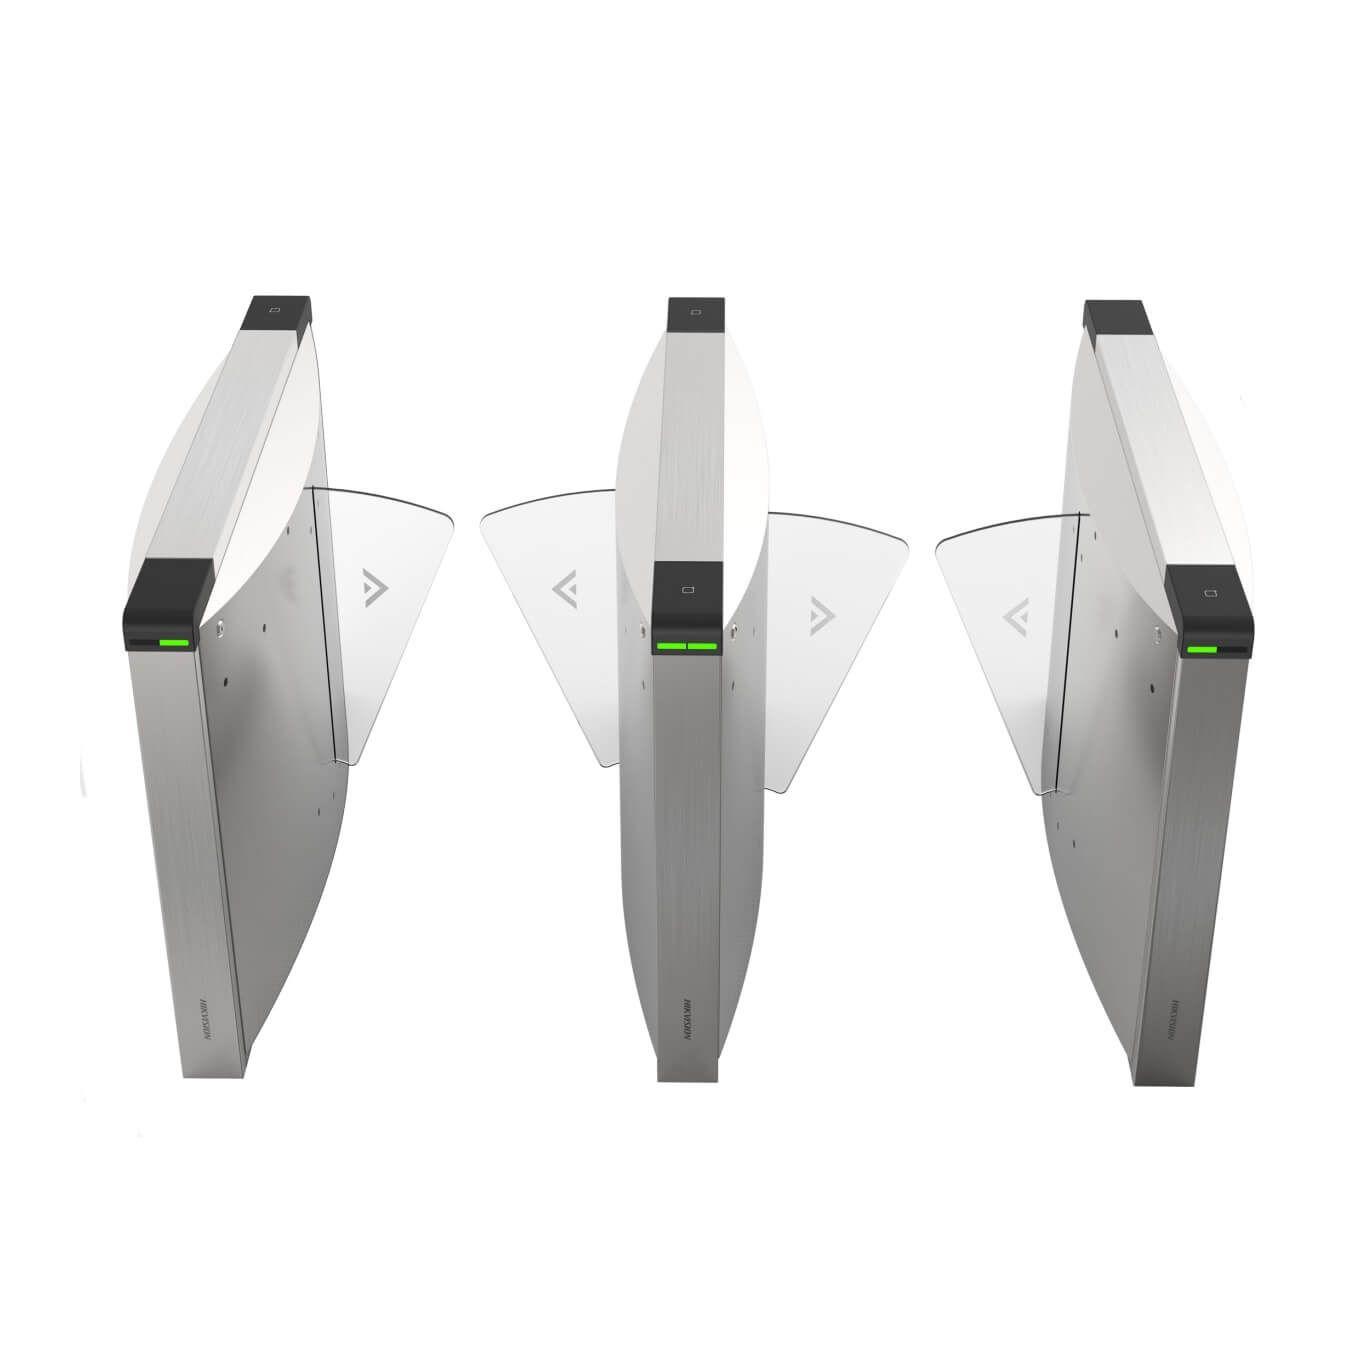 Hikvision DS-K3Y501